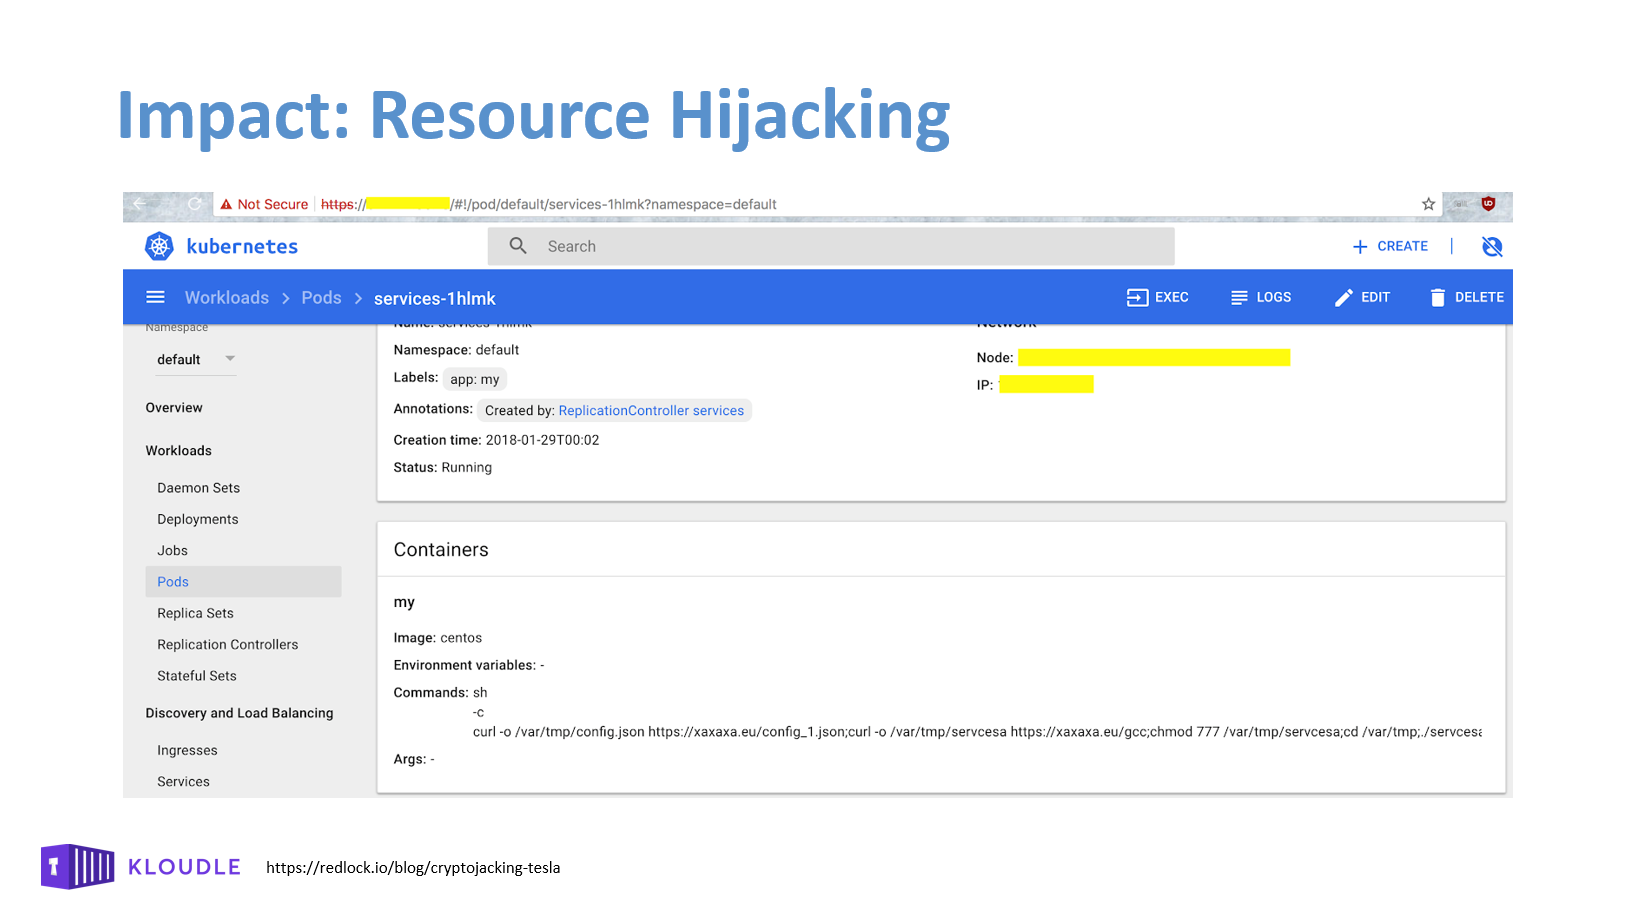 Impact: Resource Hijacking